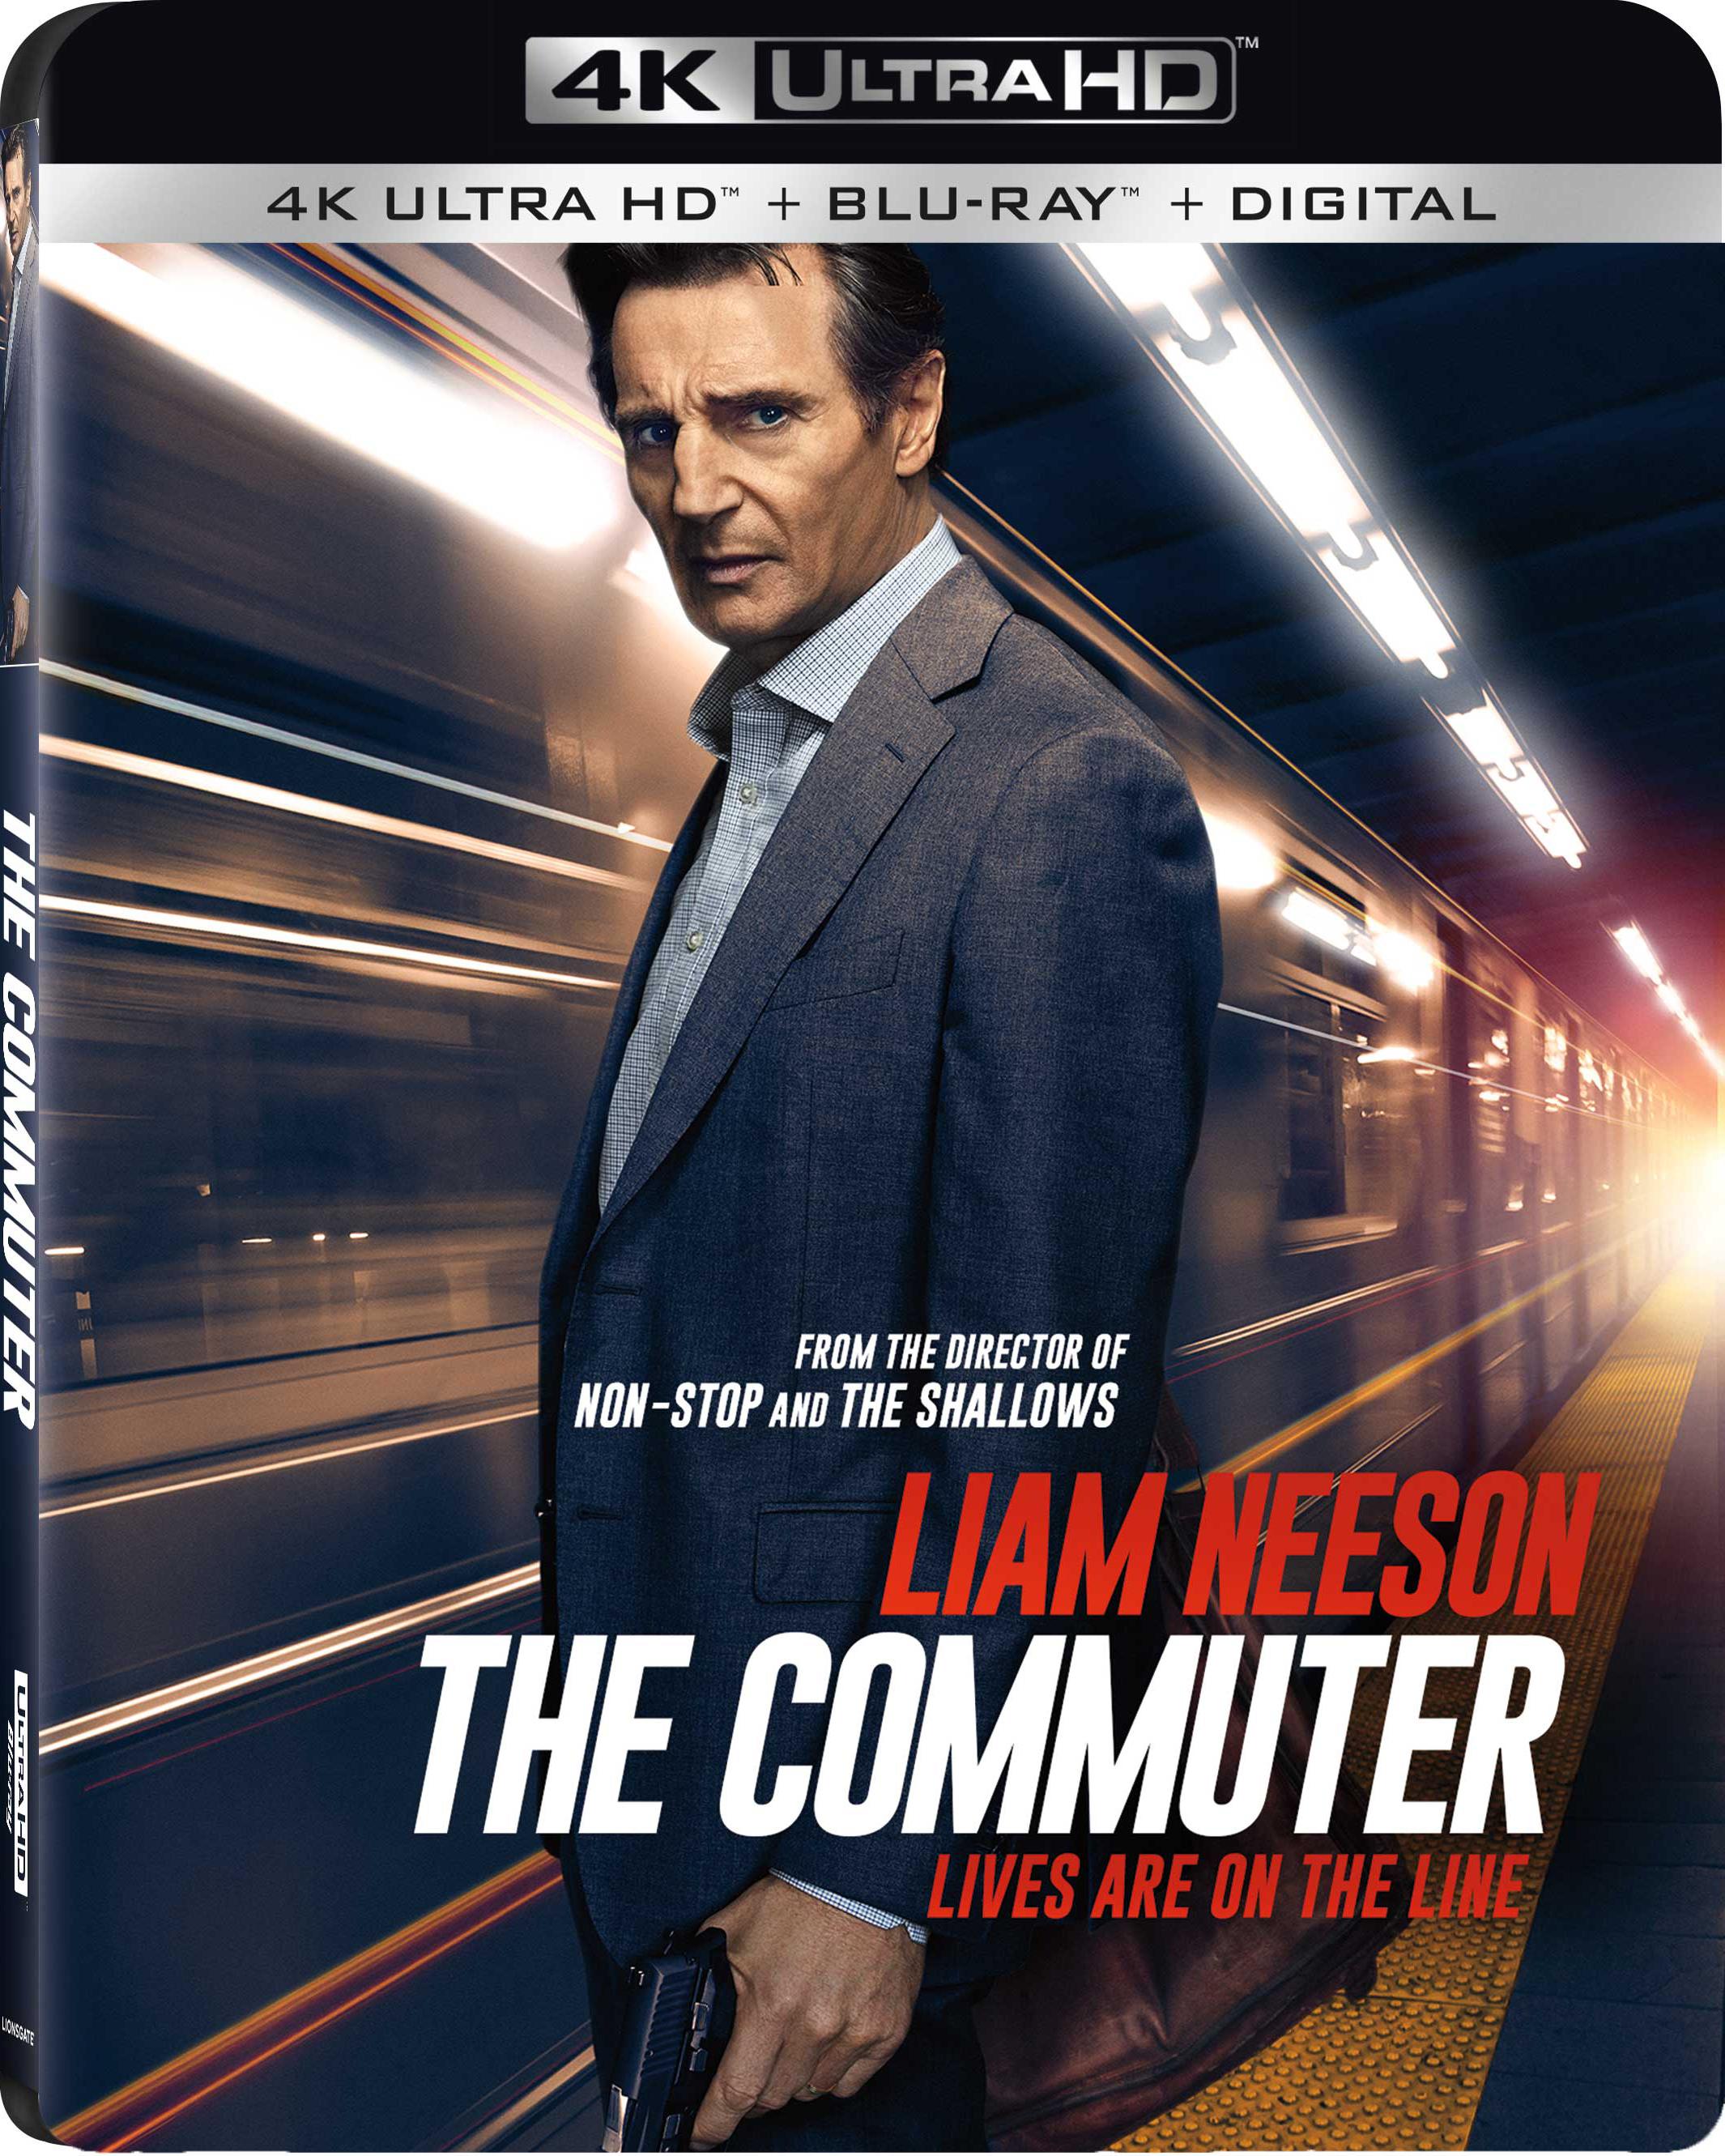 The Commuter 4K (2018) 4K Ultra HD Blu-ray